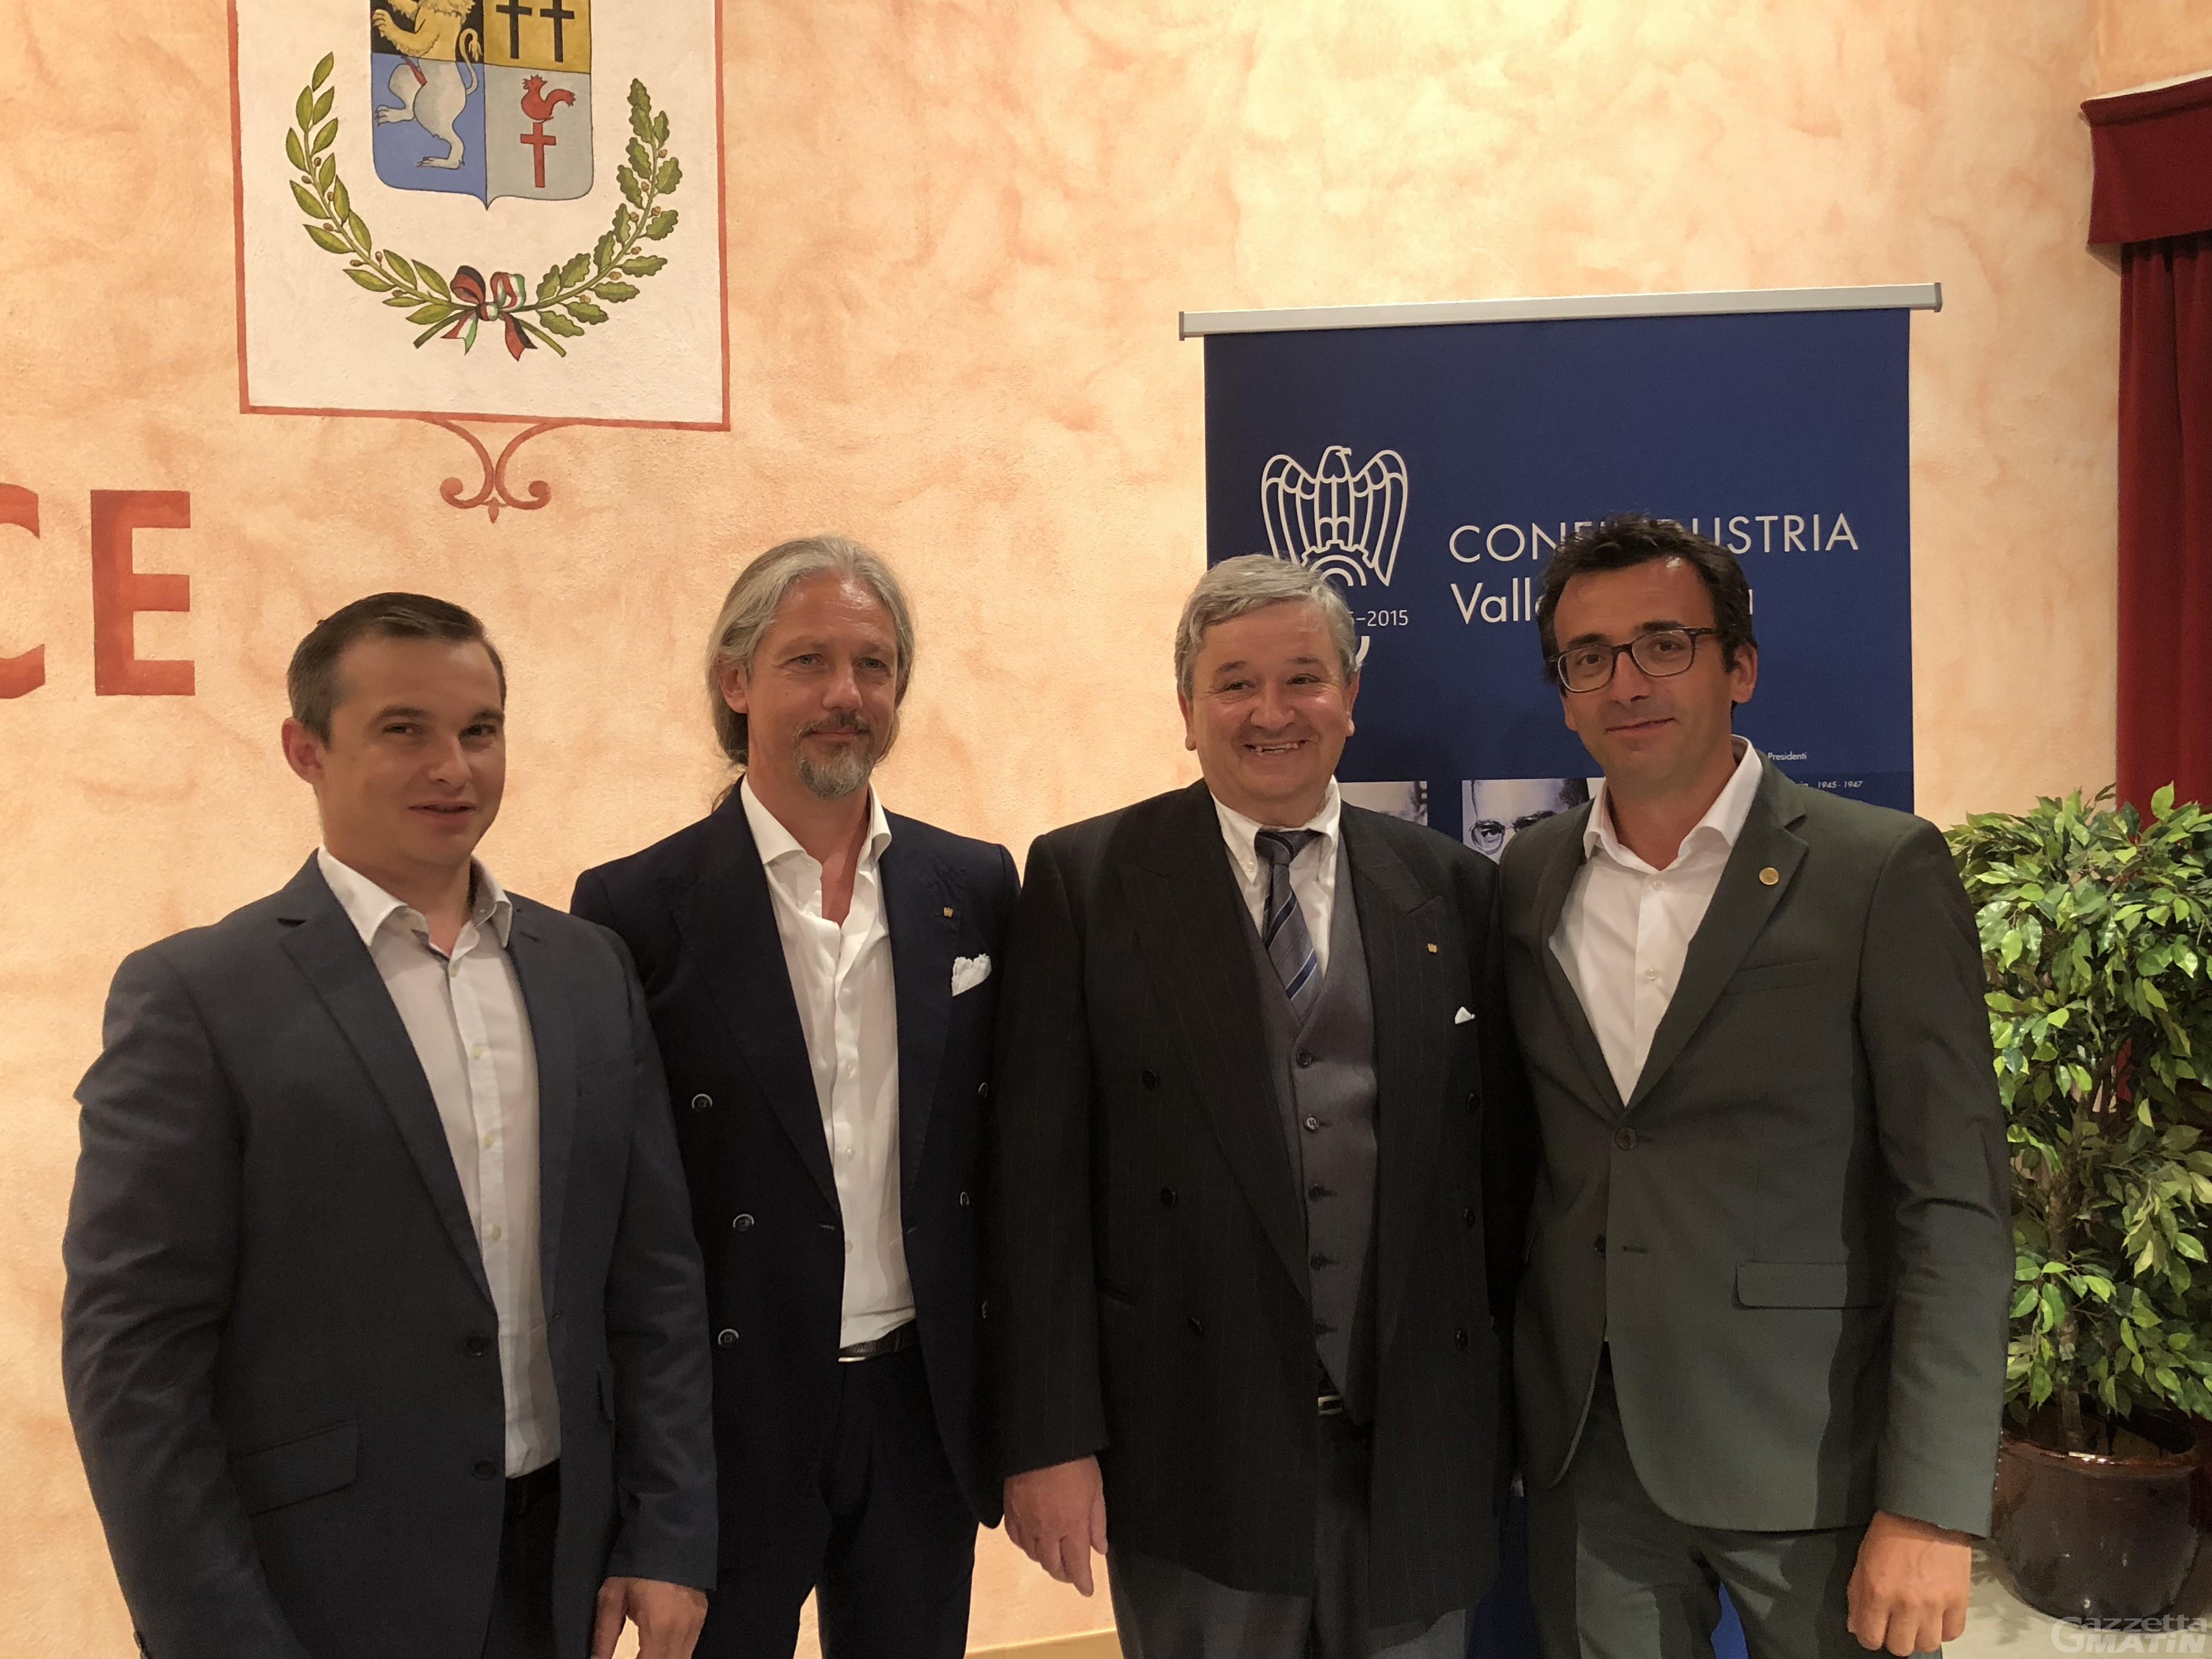 Confindustria Vda: Giancarlo Giachino nuovo presidente